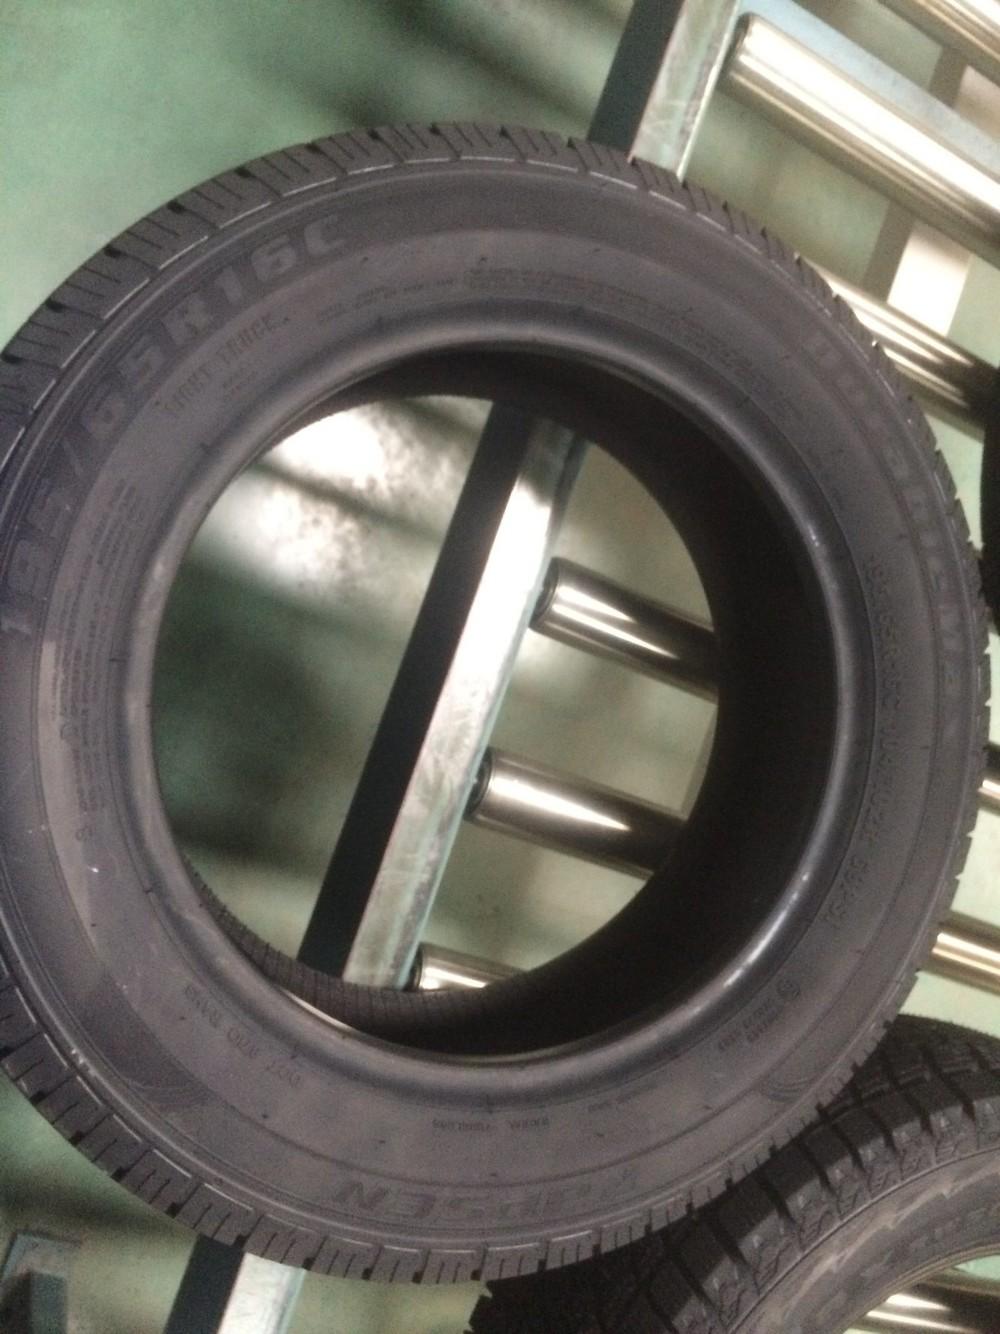 Best Car Auto Part Tire Factory in China Triangle Zextour Hilo Agate Compasal 185/65r15 175/70r13 185/70r14 185r14 Passenger Car Tire